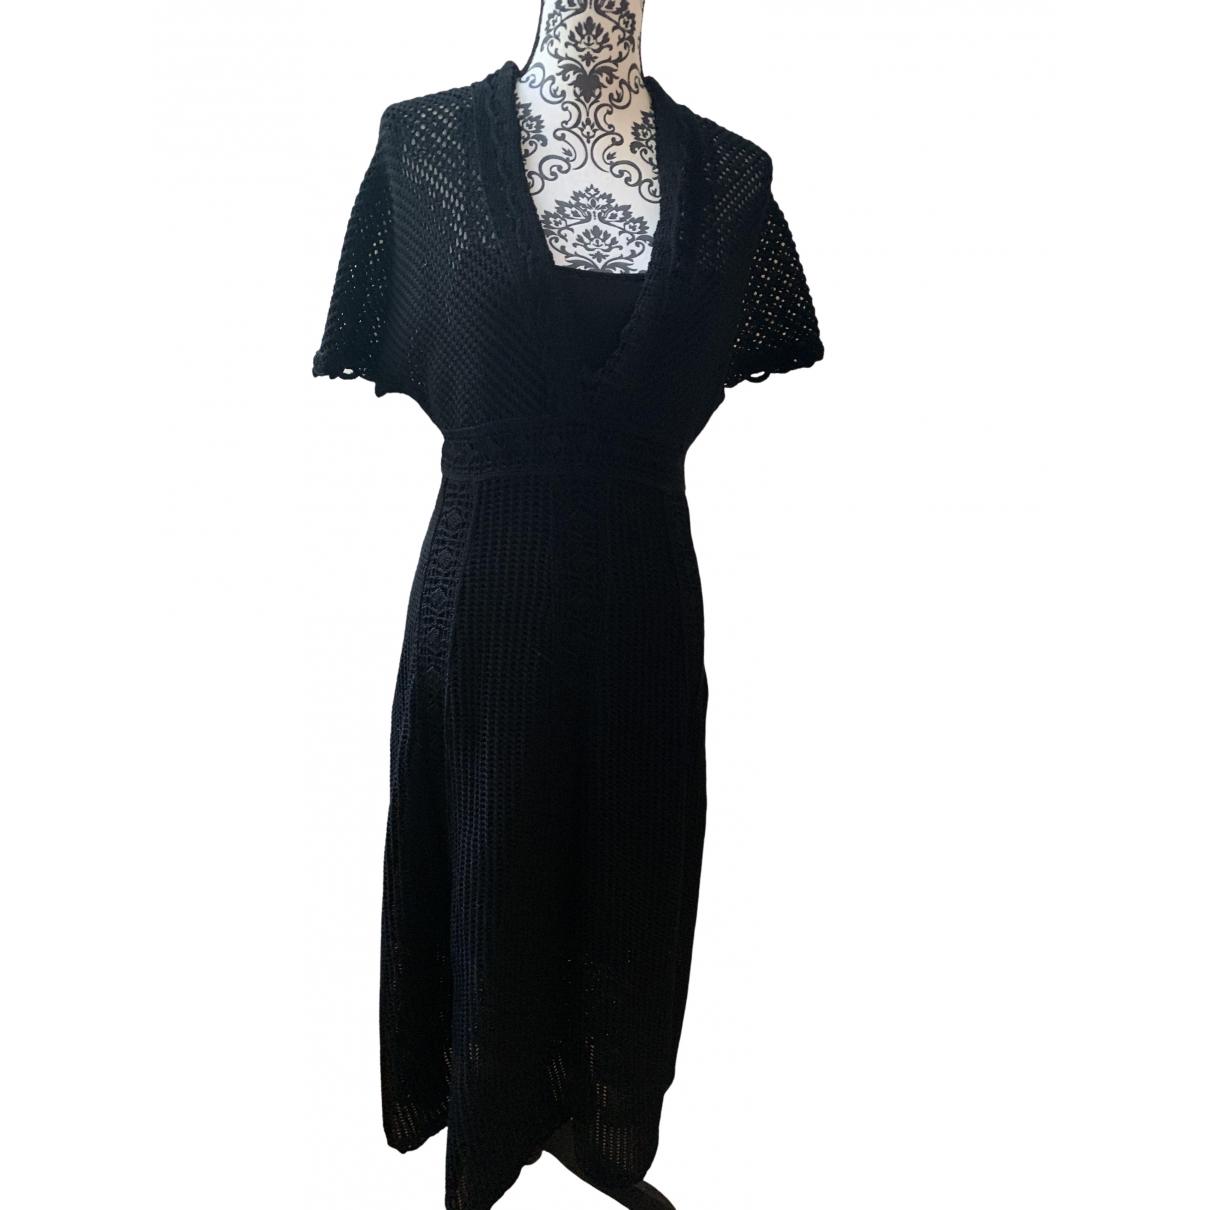 Dior \N Black Cotton dress for Women 40 FR